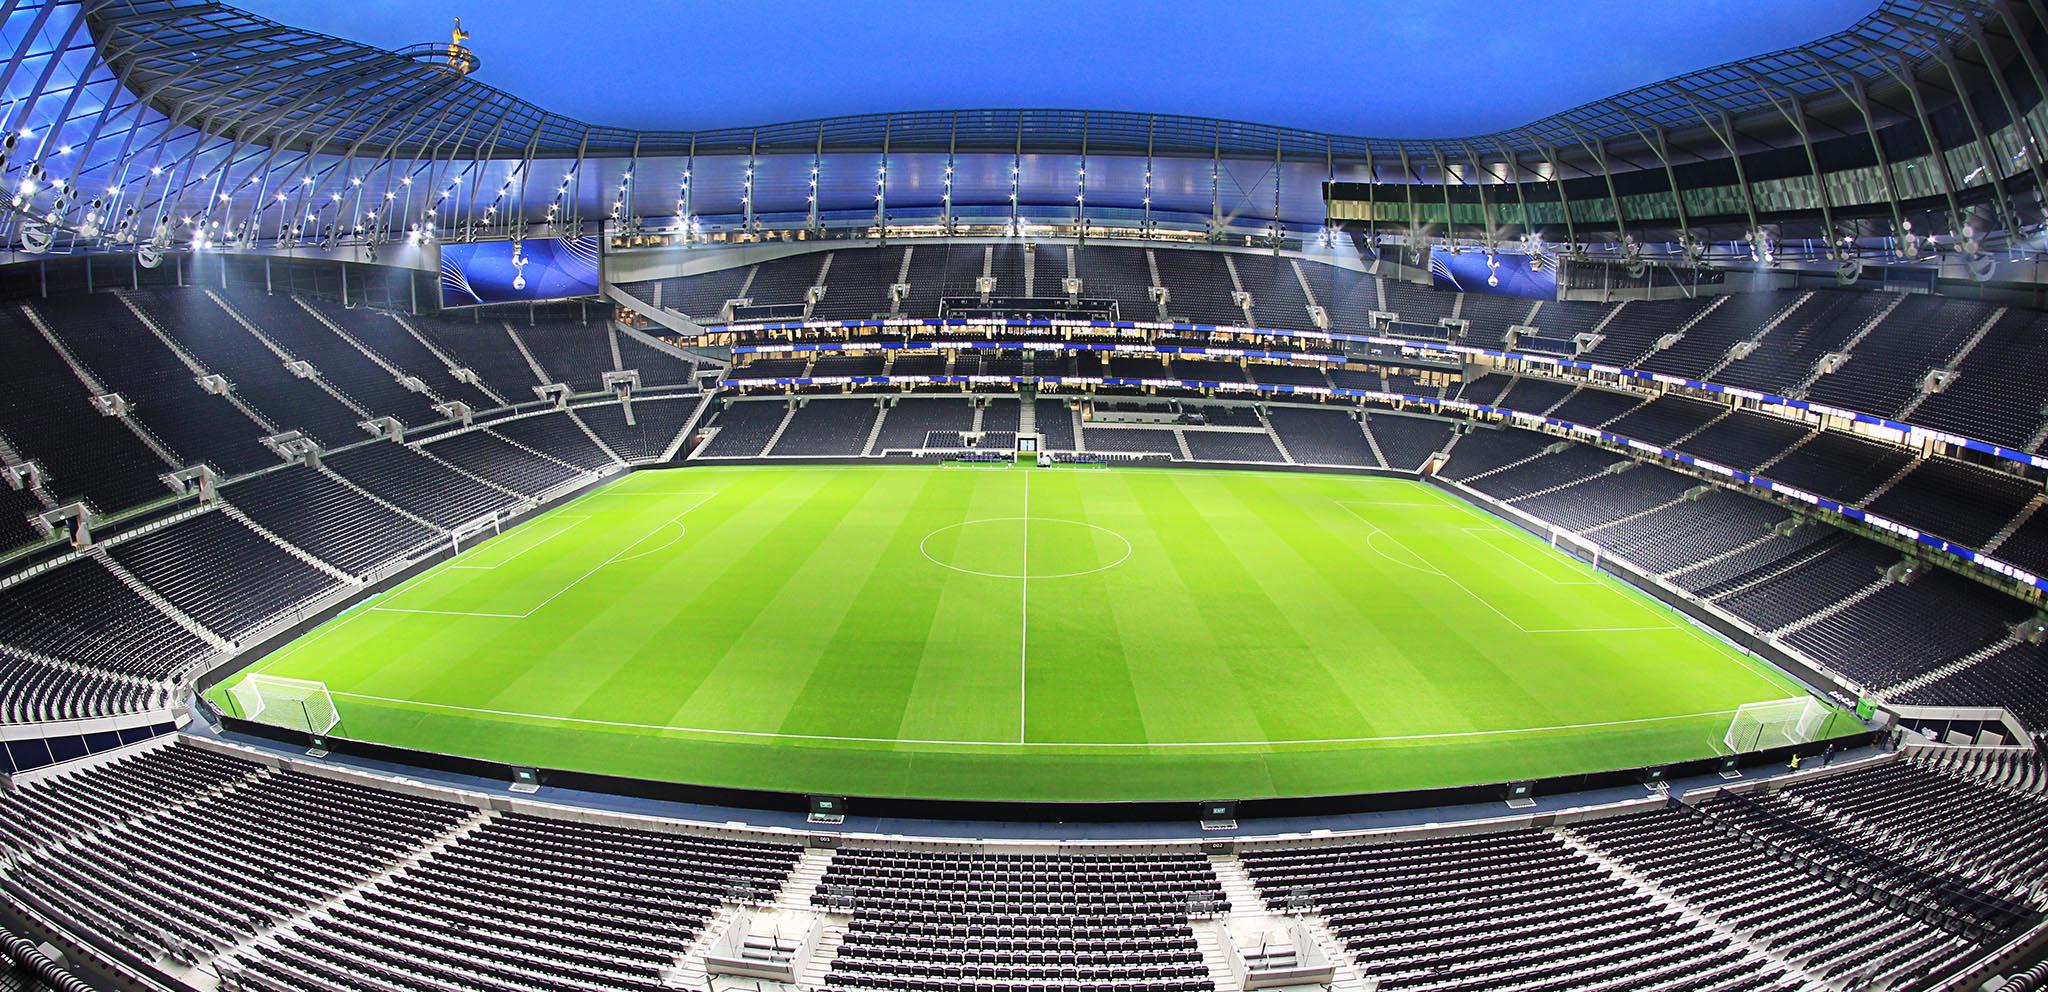 Resultado de imagen para Tottenham Hotspur Stadium